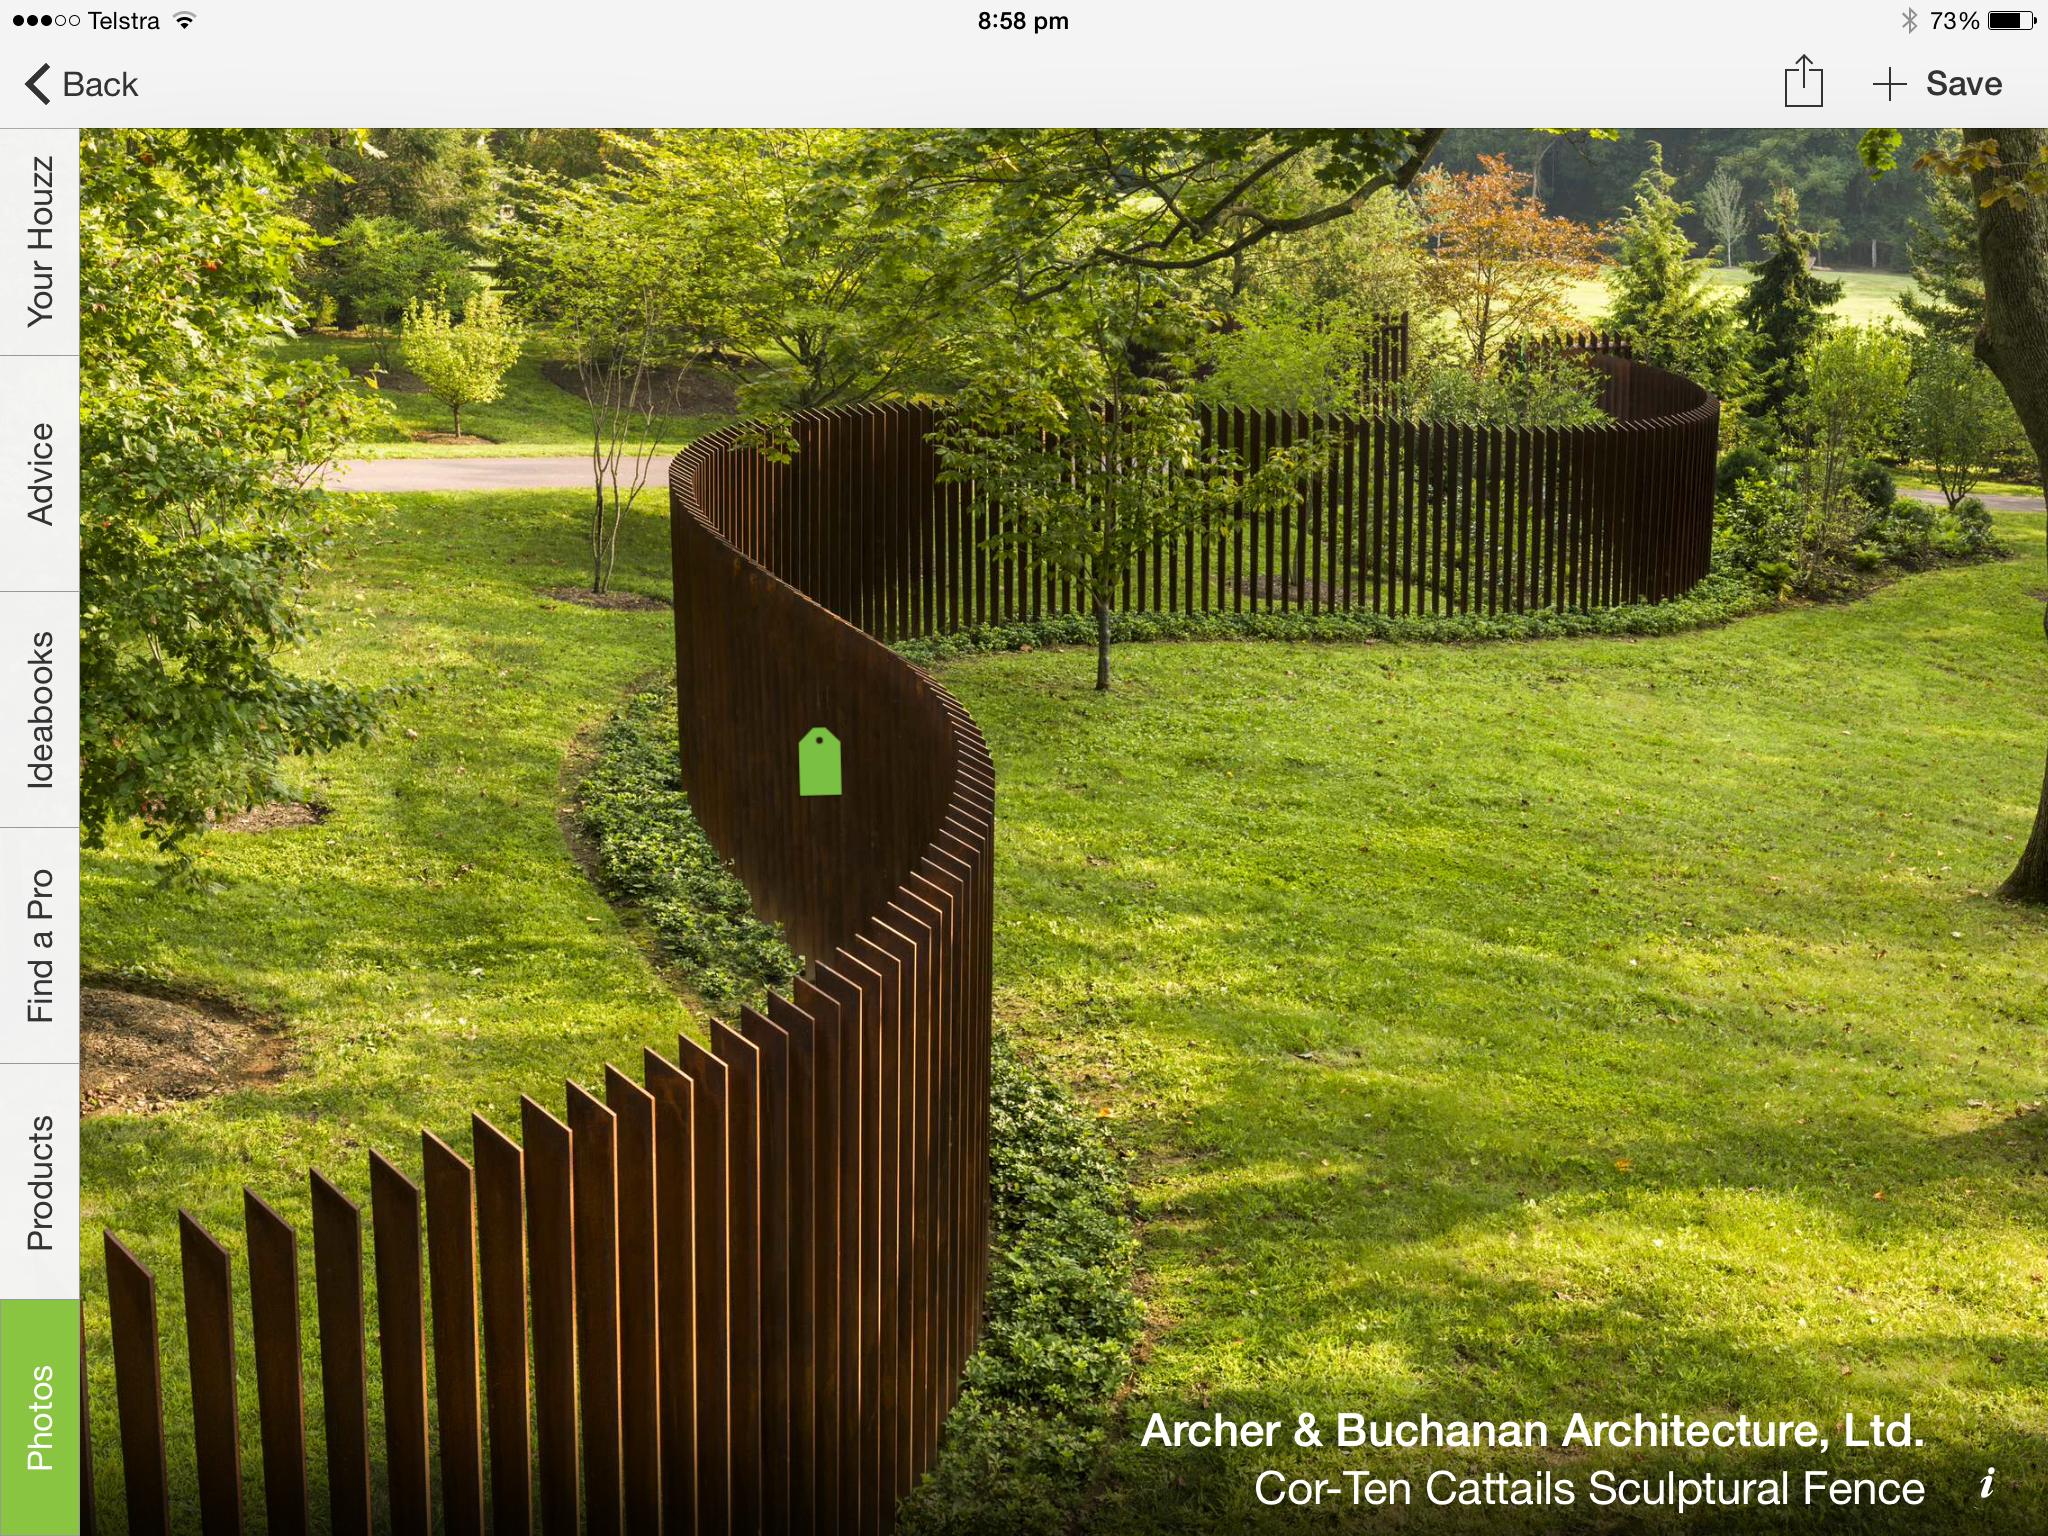 Pin by Constant Gardener on Garden Pinterest Garden pots and Gardens